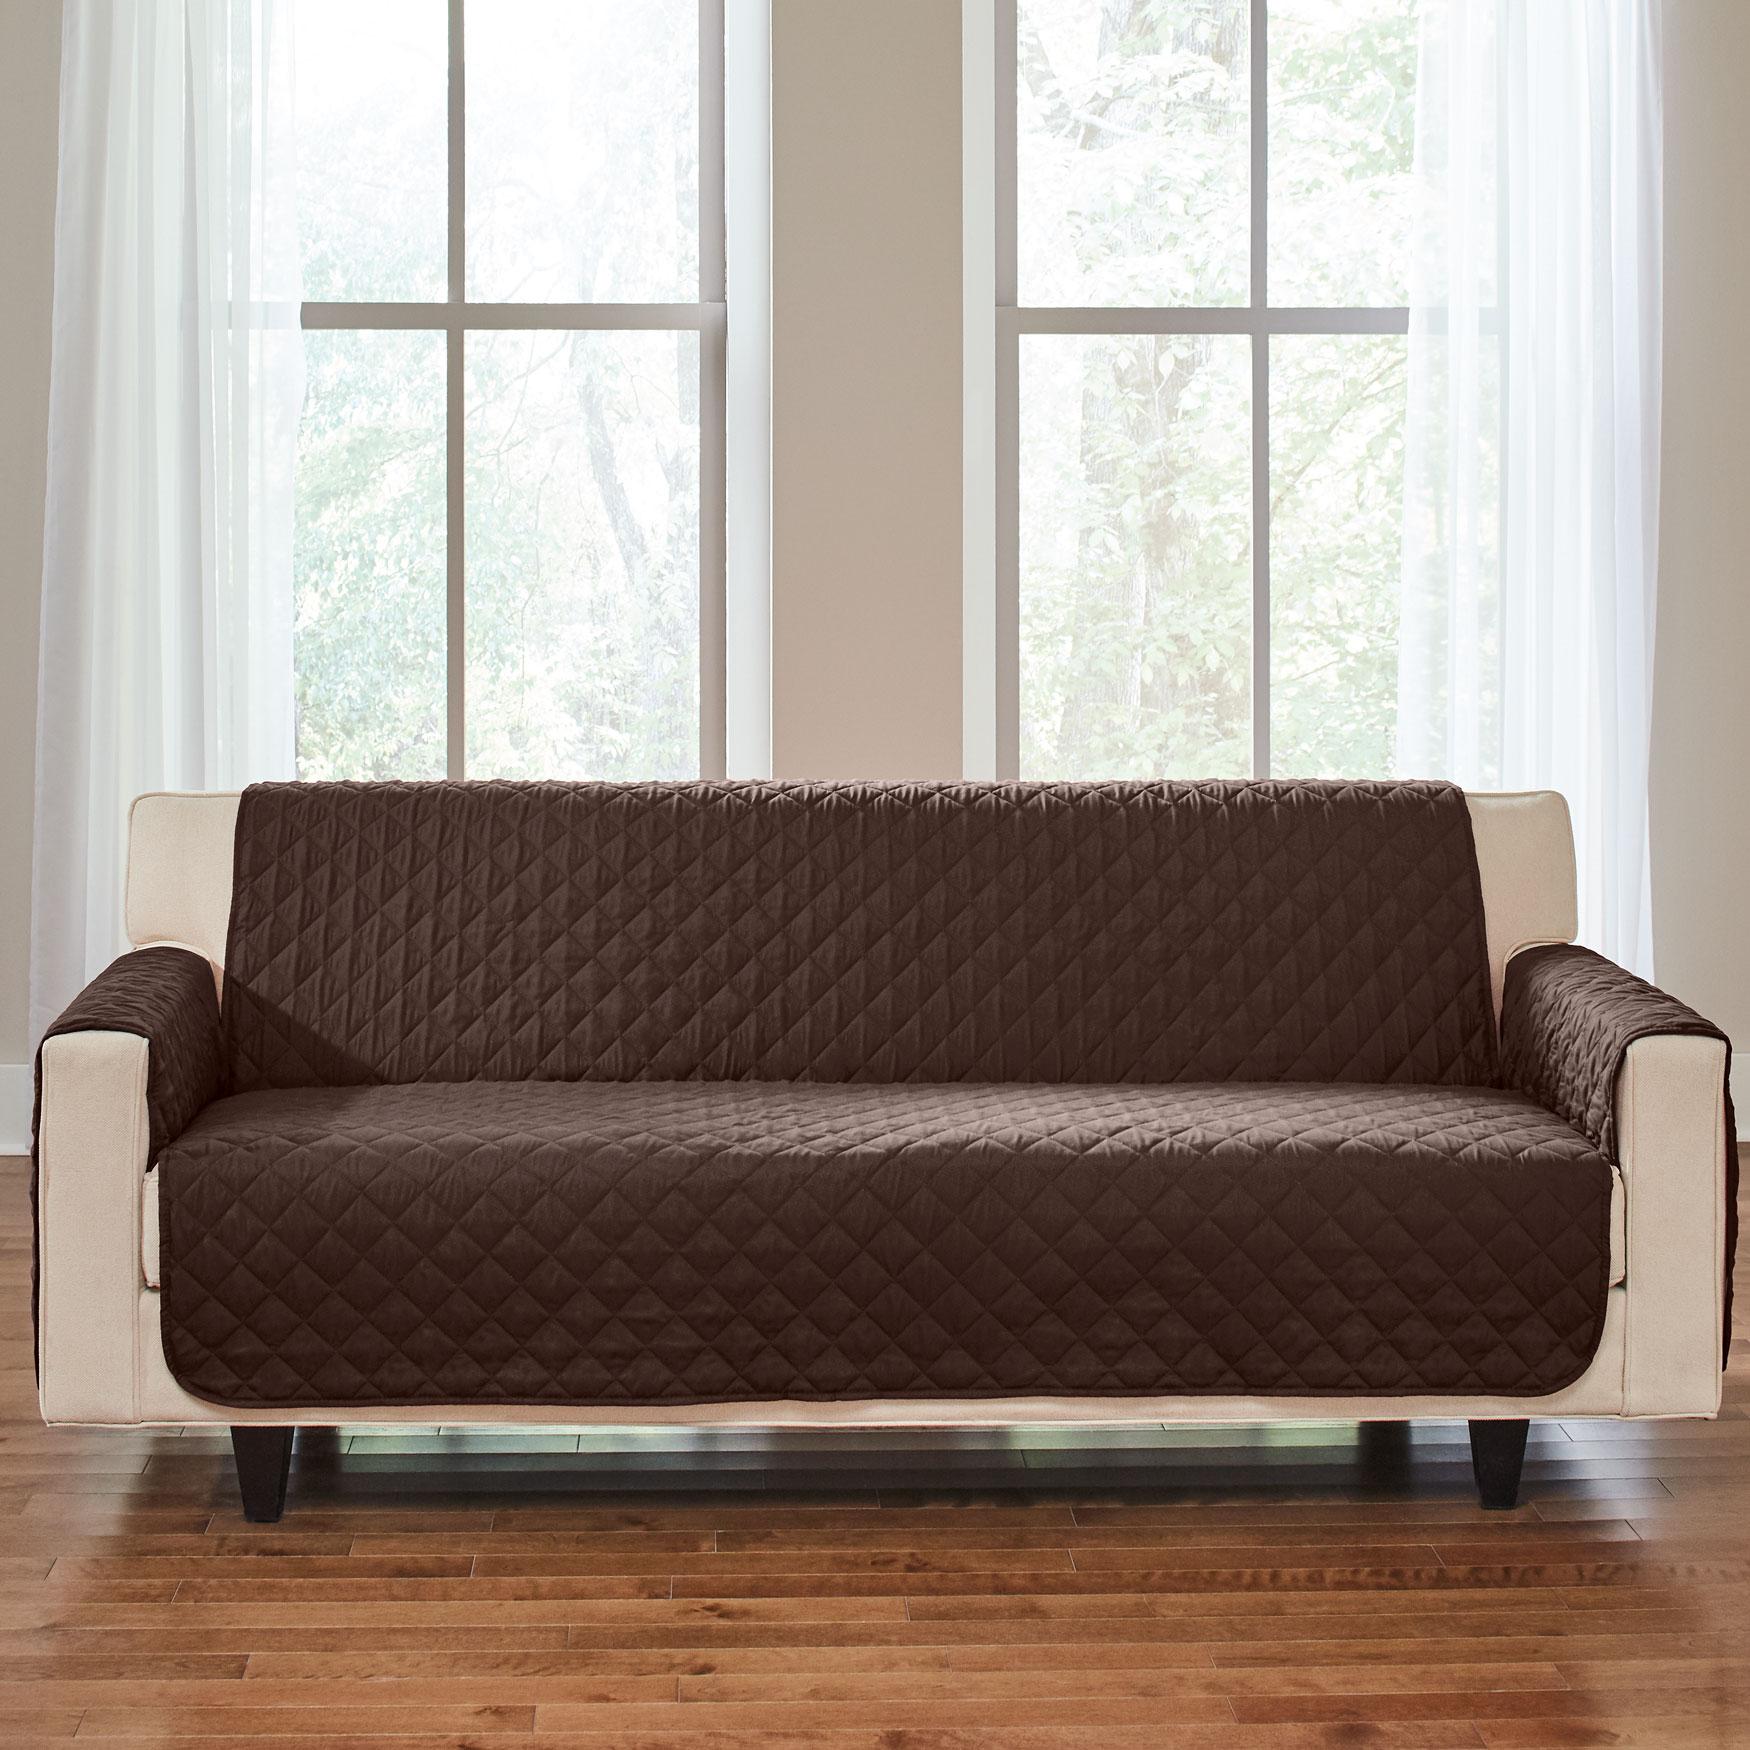 Microfiber Extra Long Sofa Protector